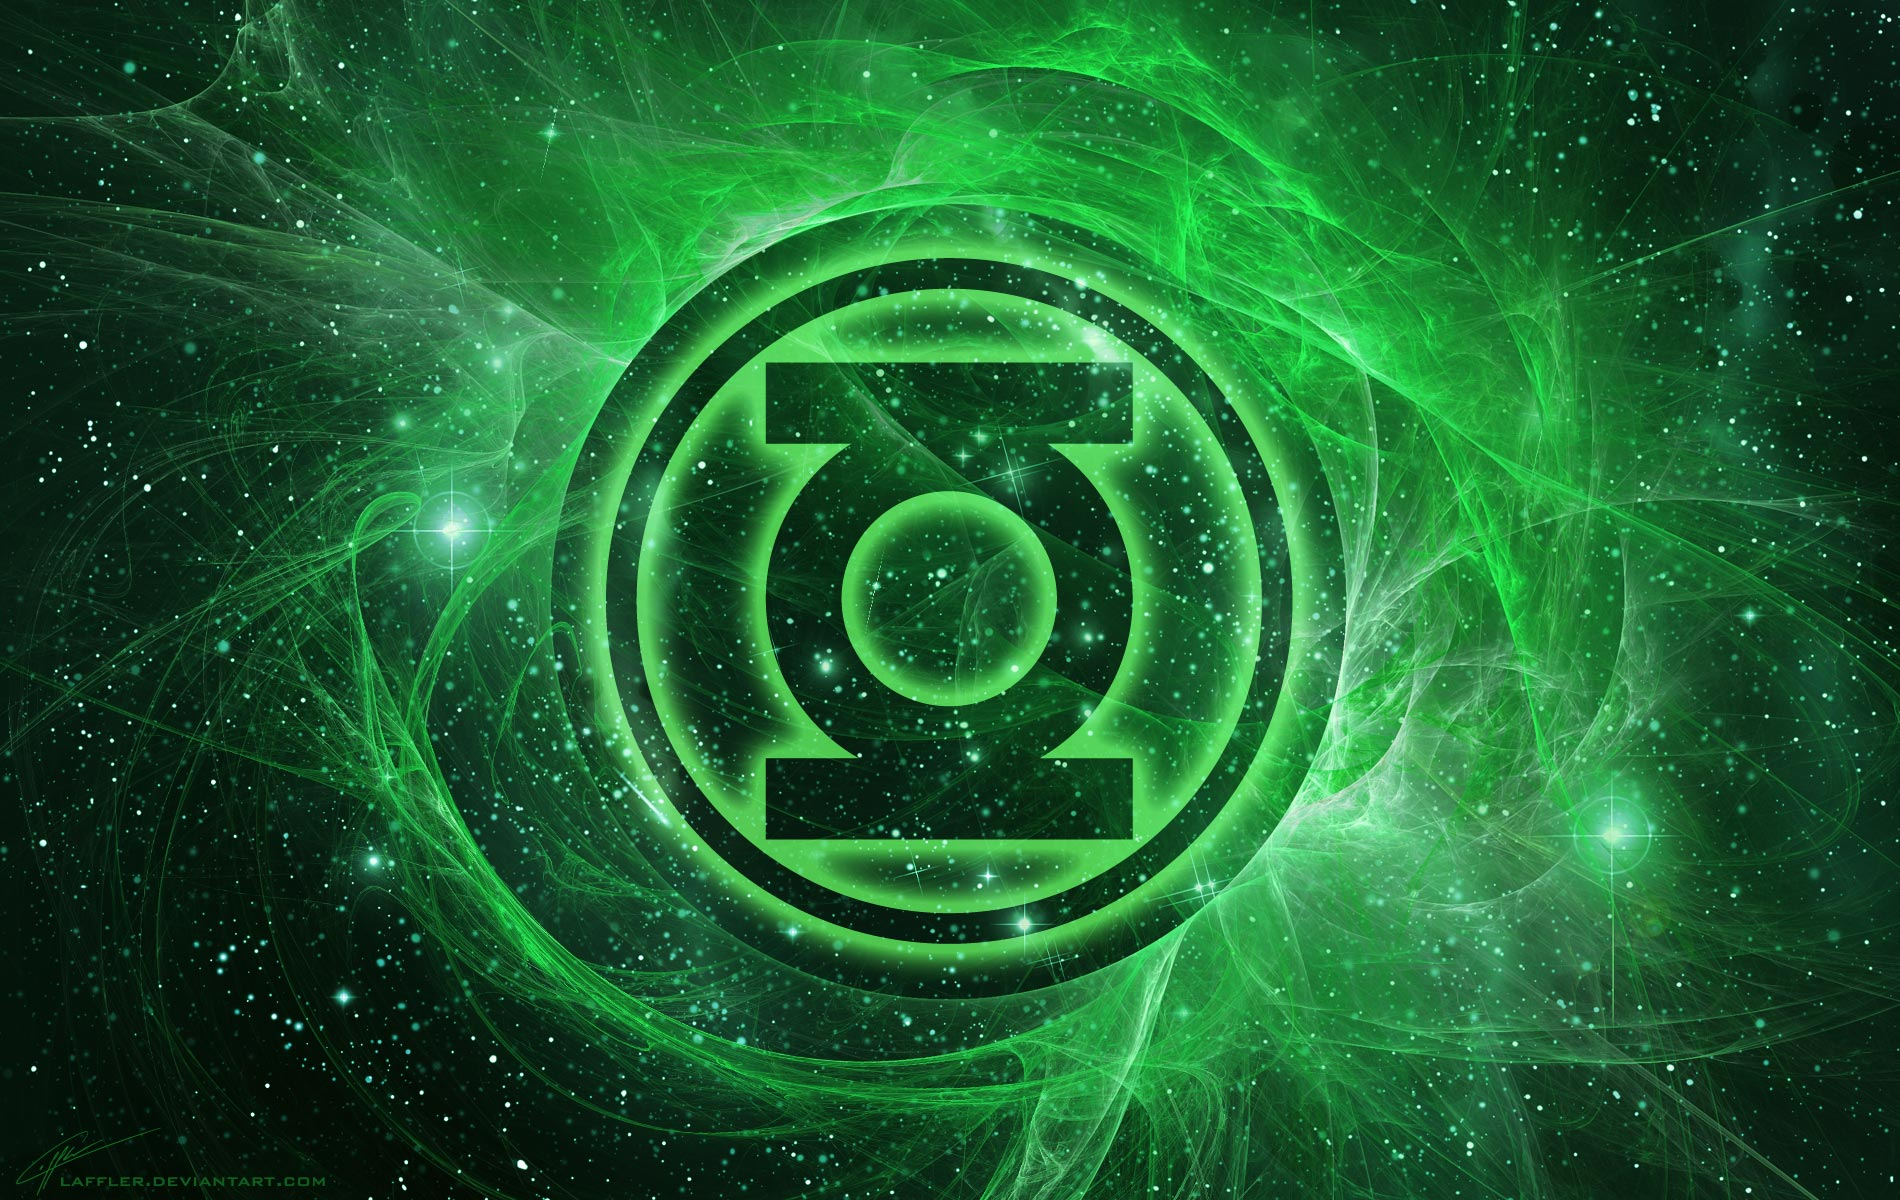 Green Lantern Corps Wallpapers by Laffler on DeviantArt